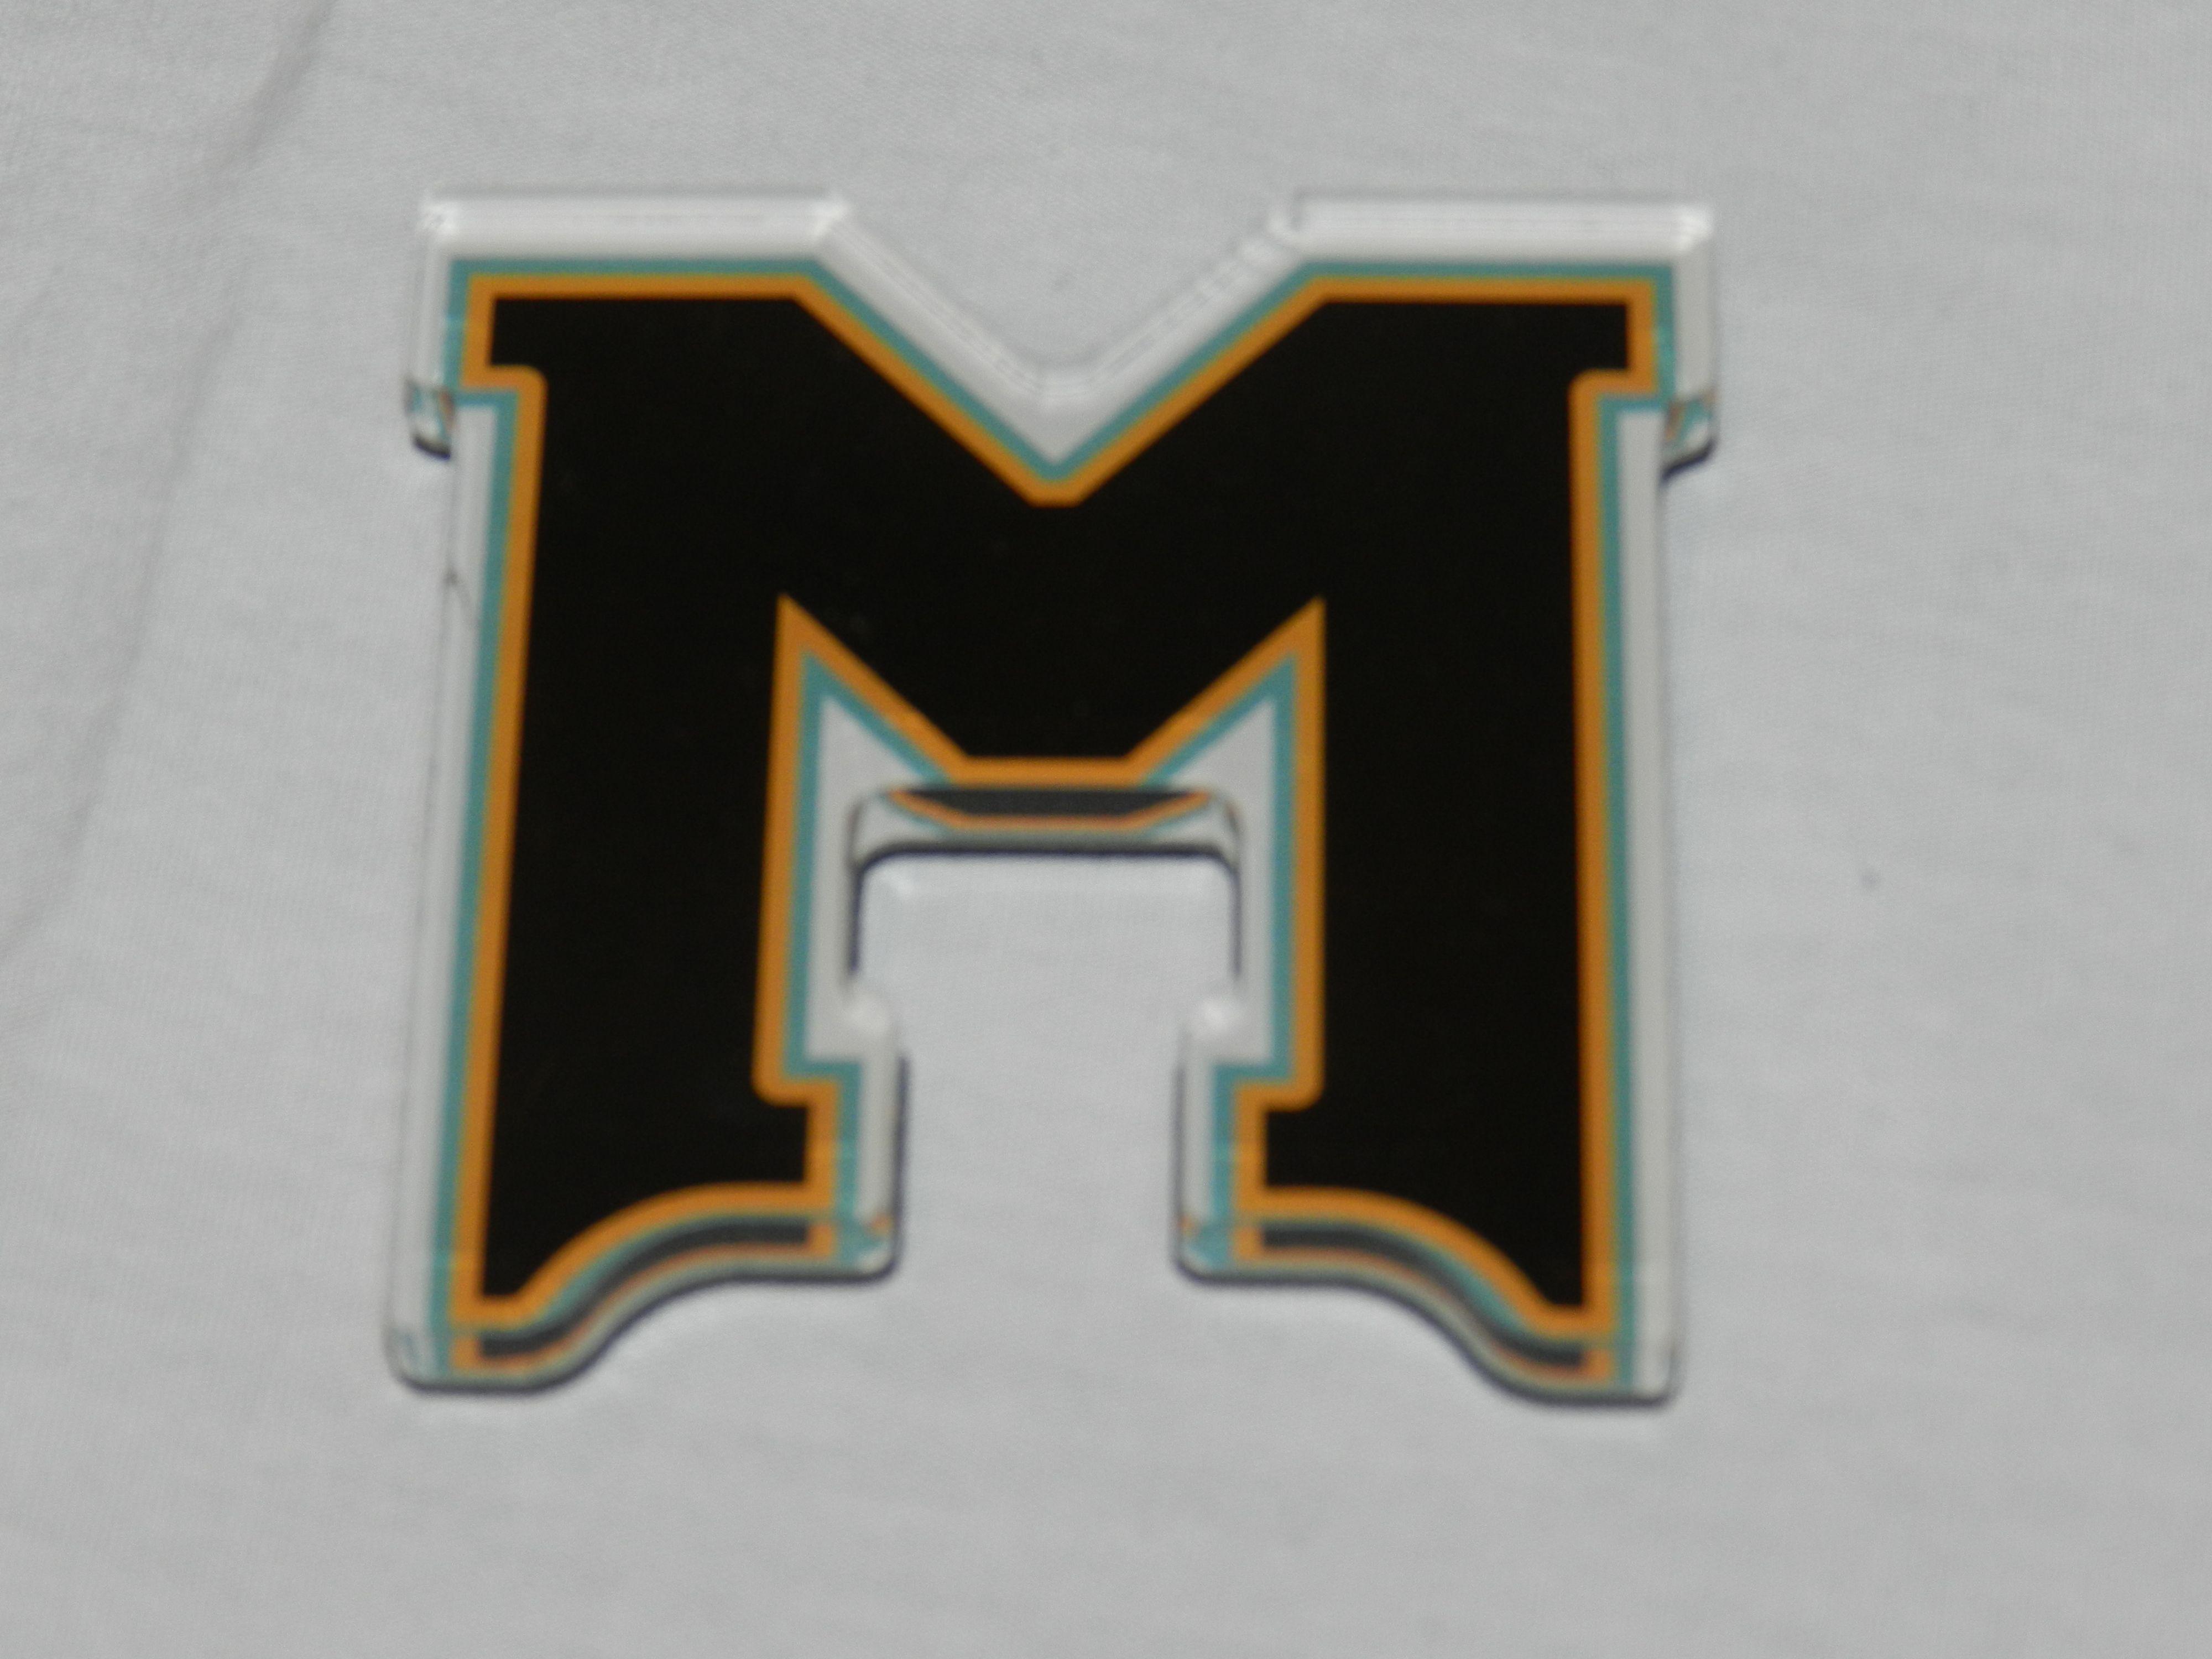 M/W Houston astros logo, Astros logo, Sport